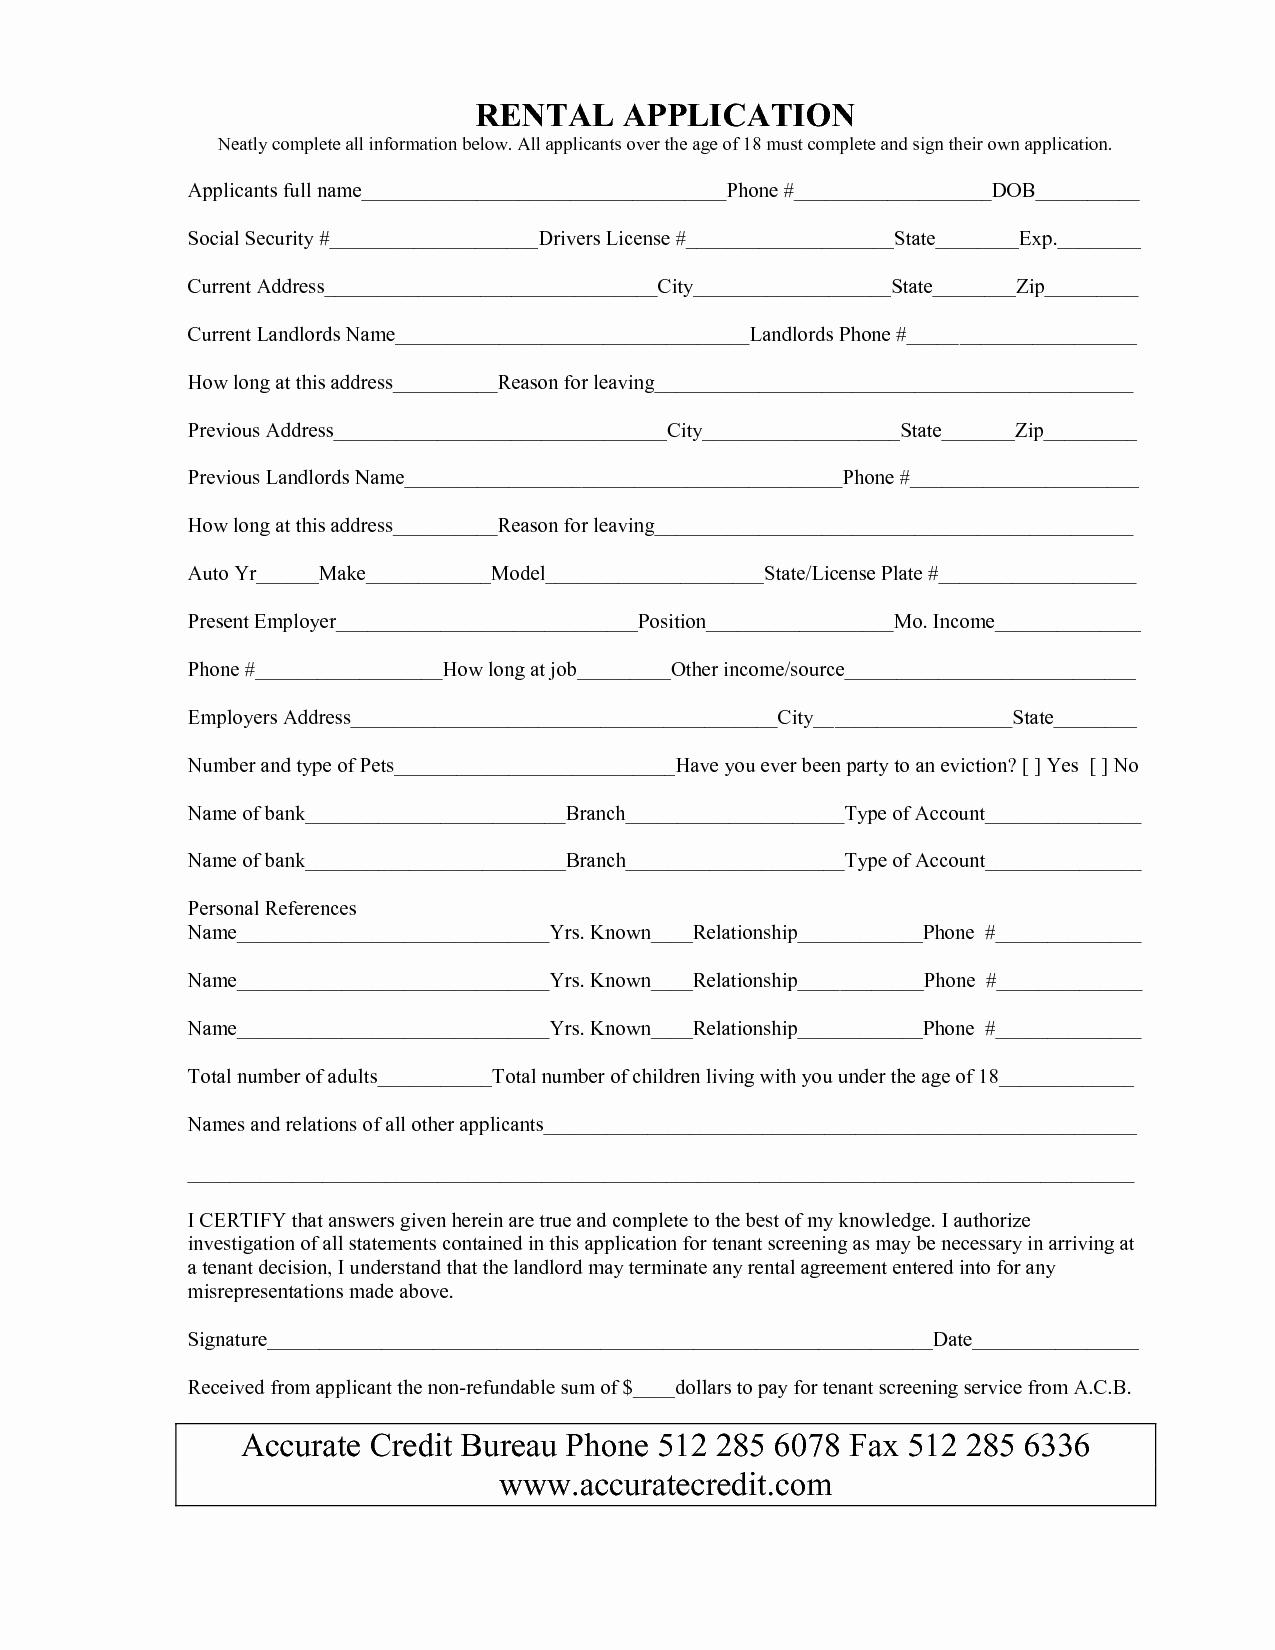 Simple Rental Agreement Pdf Elegant Simple Rental Agreement form